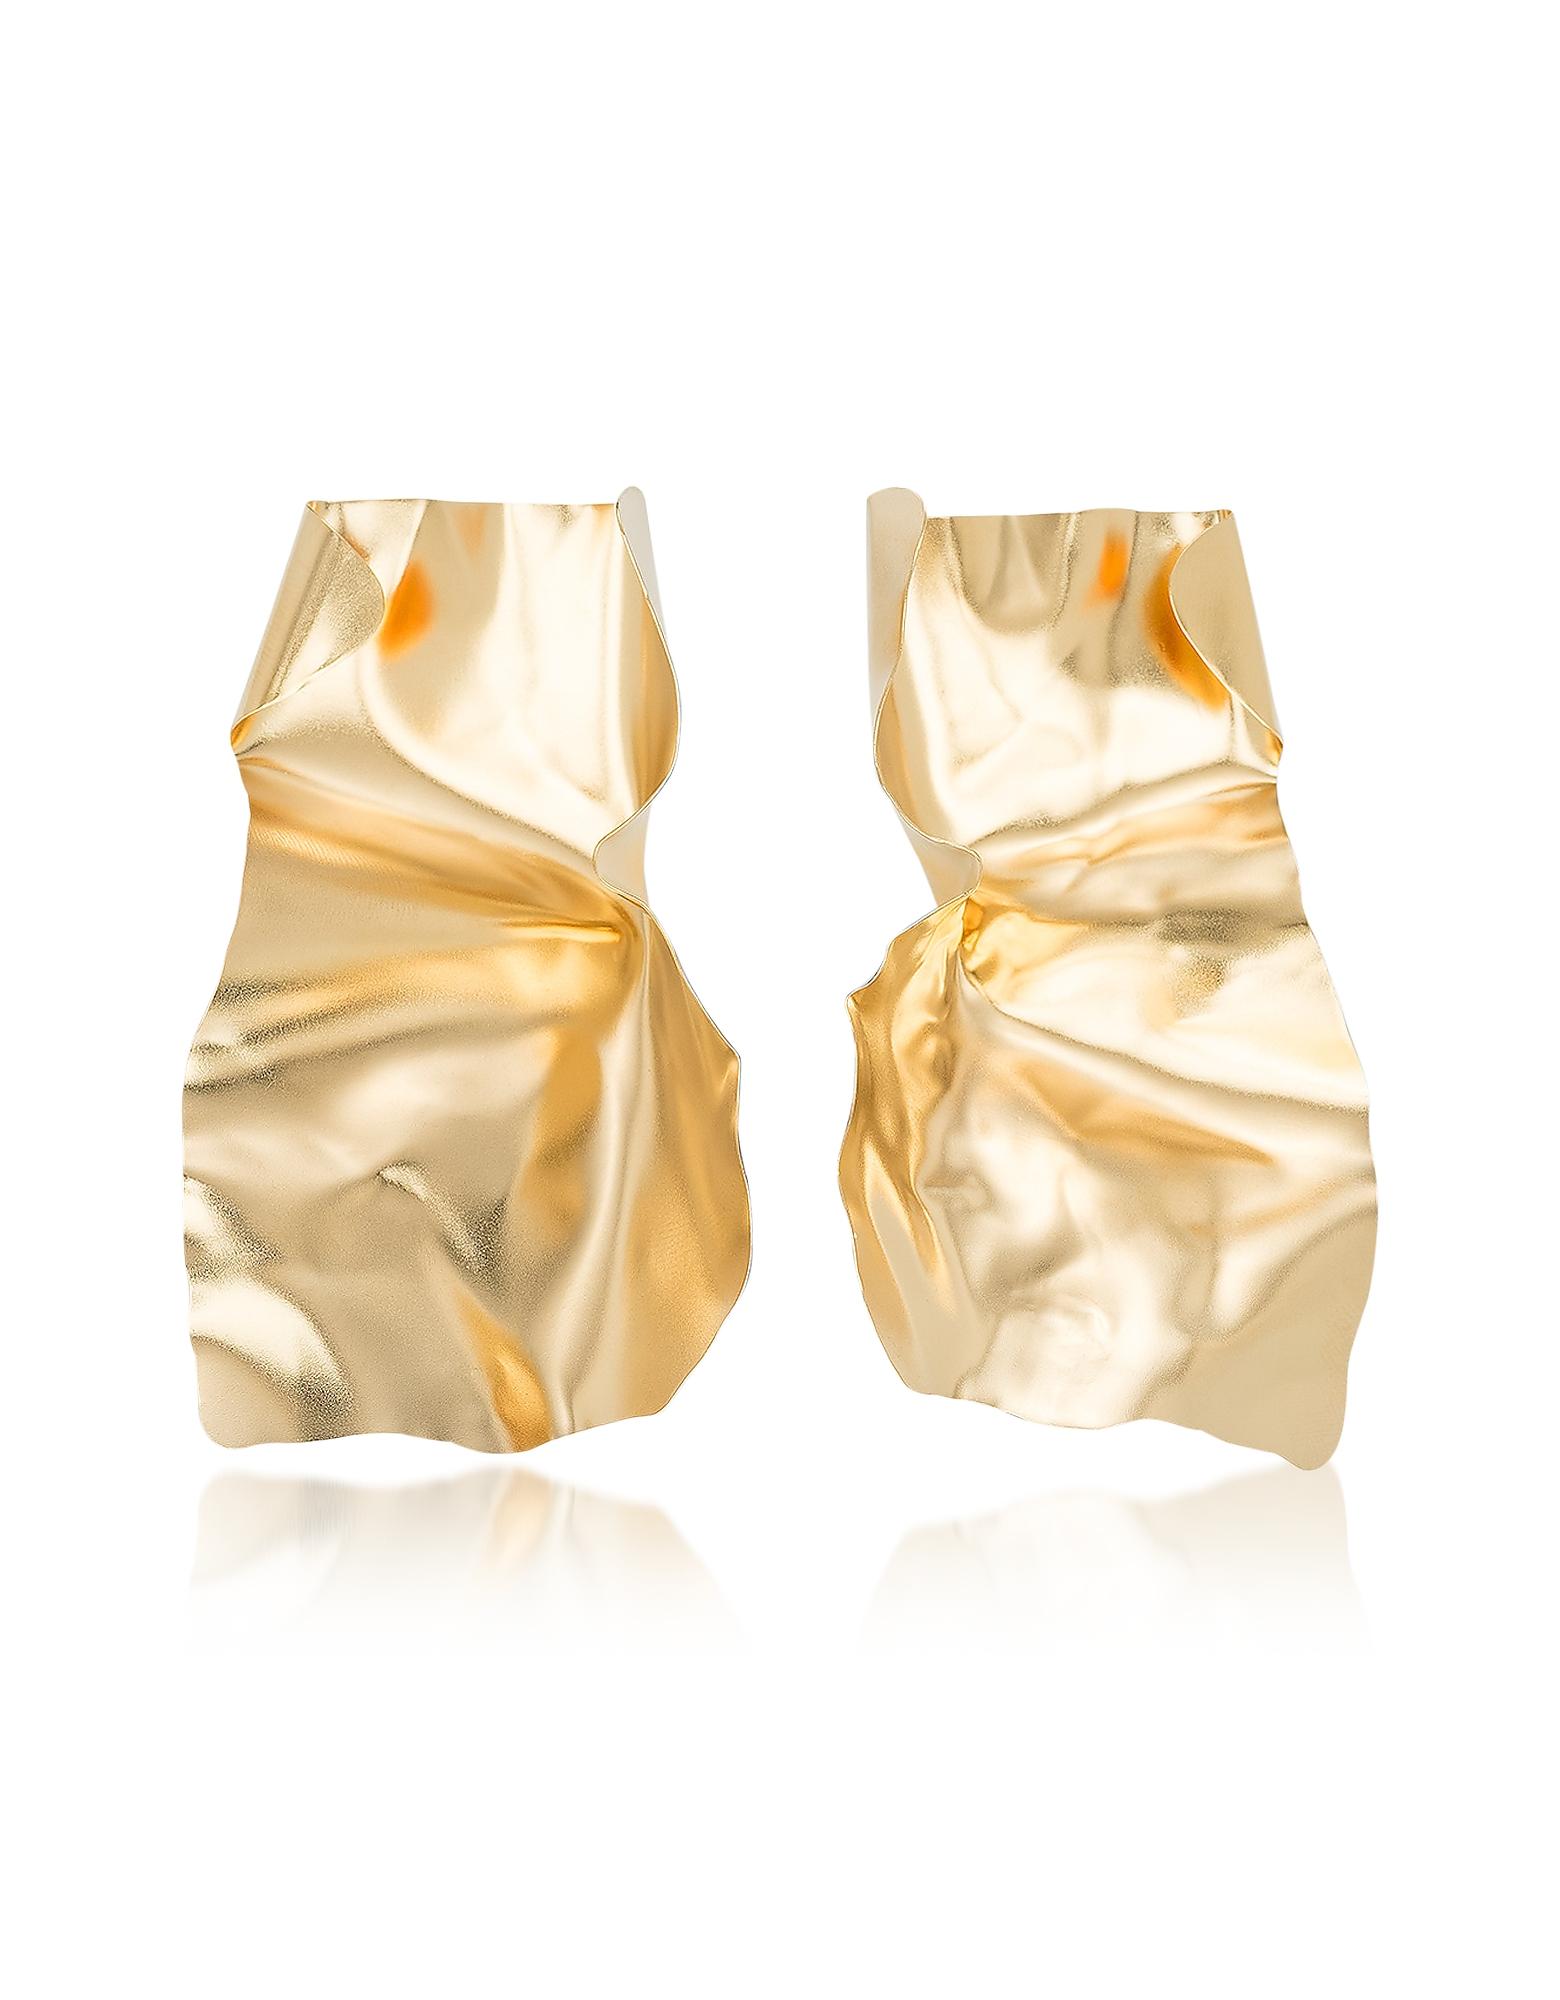 Bjorg Designer Earrings, You Were Clear & Calm Earrings